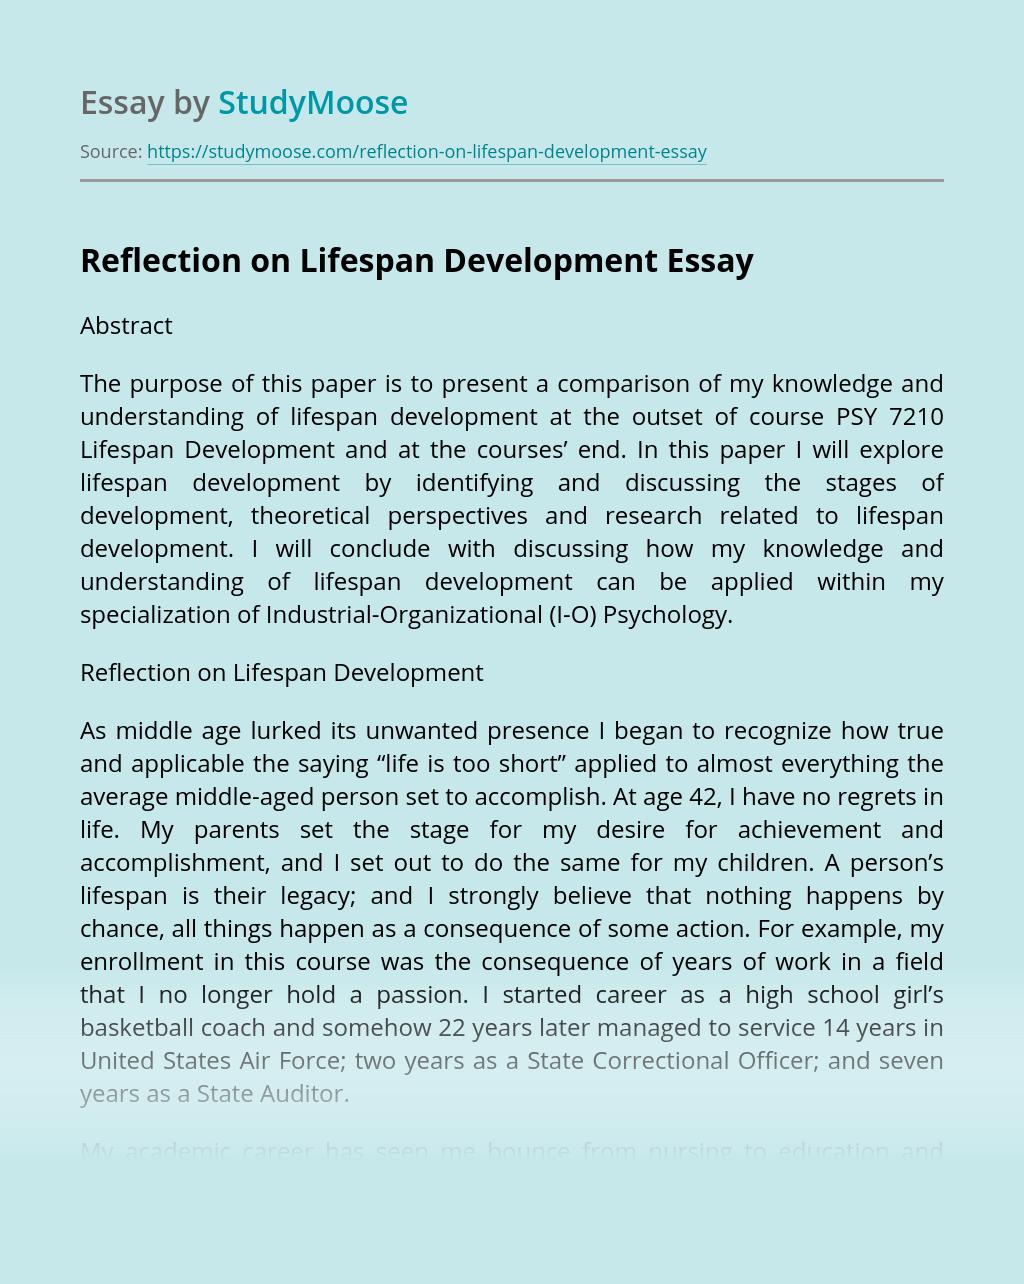 Reflection on Lifespan Development